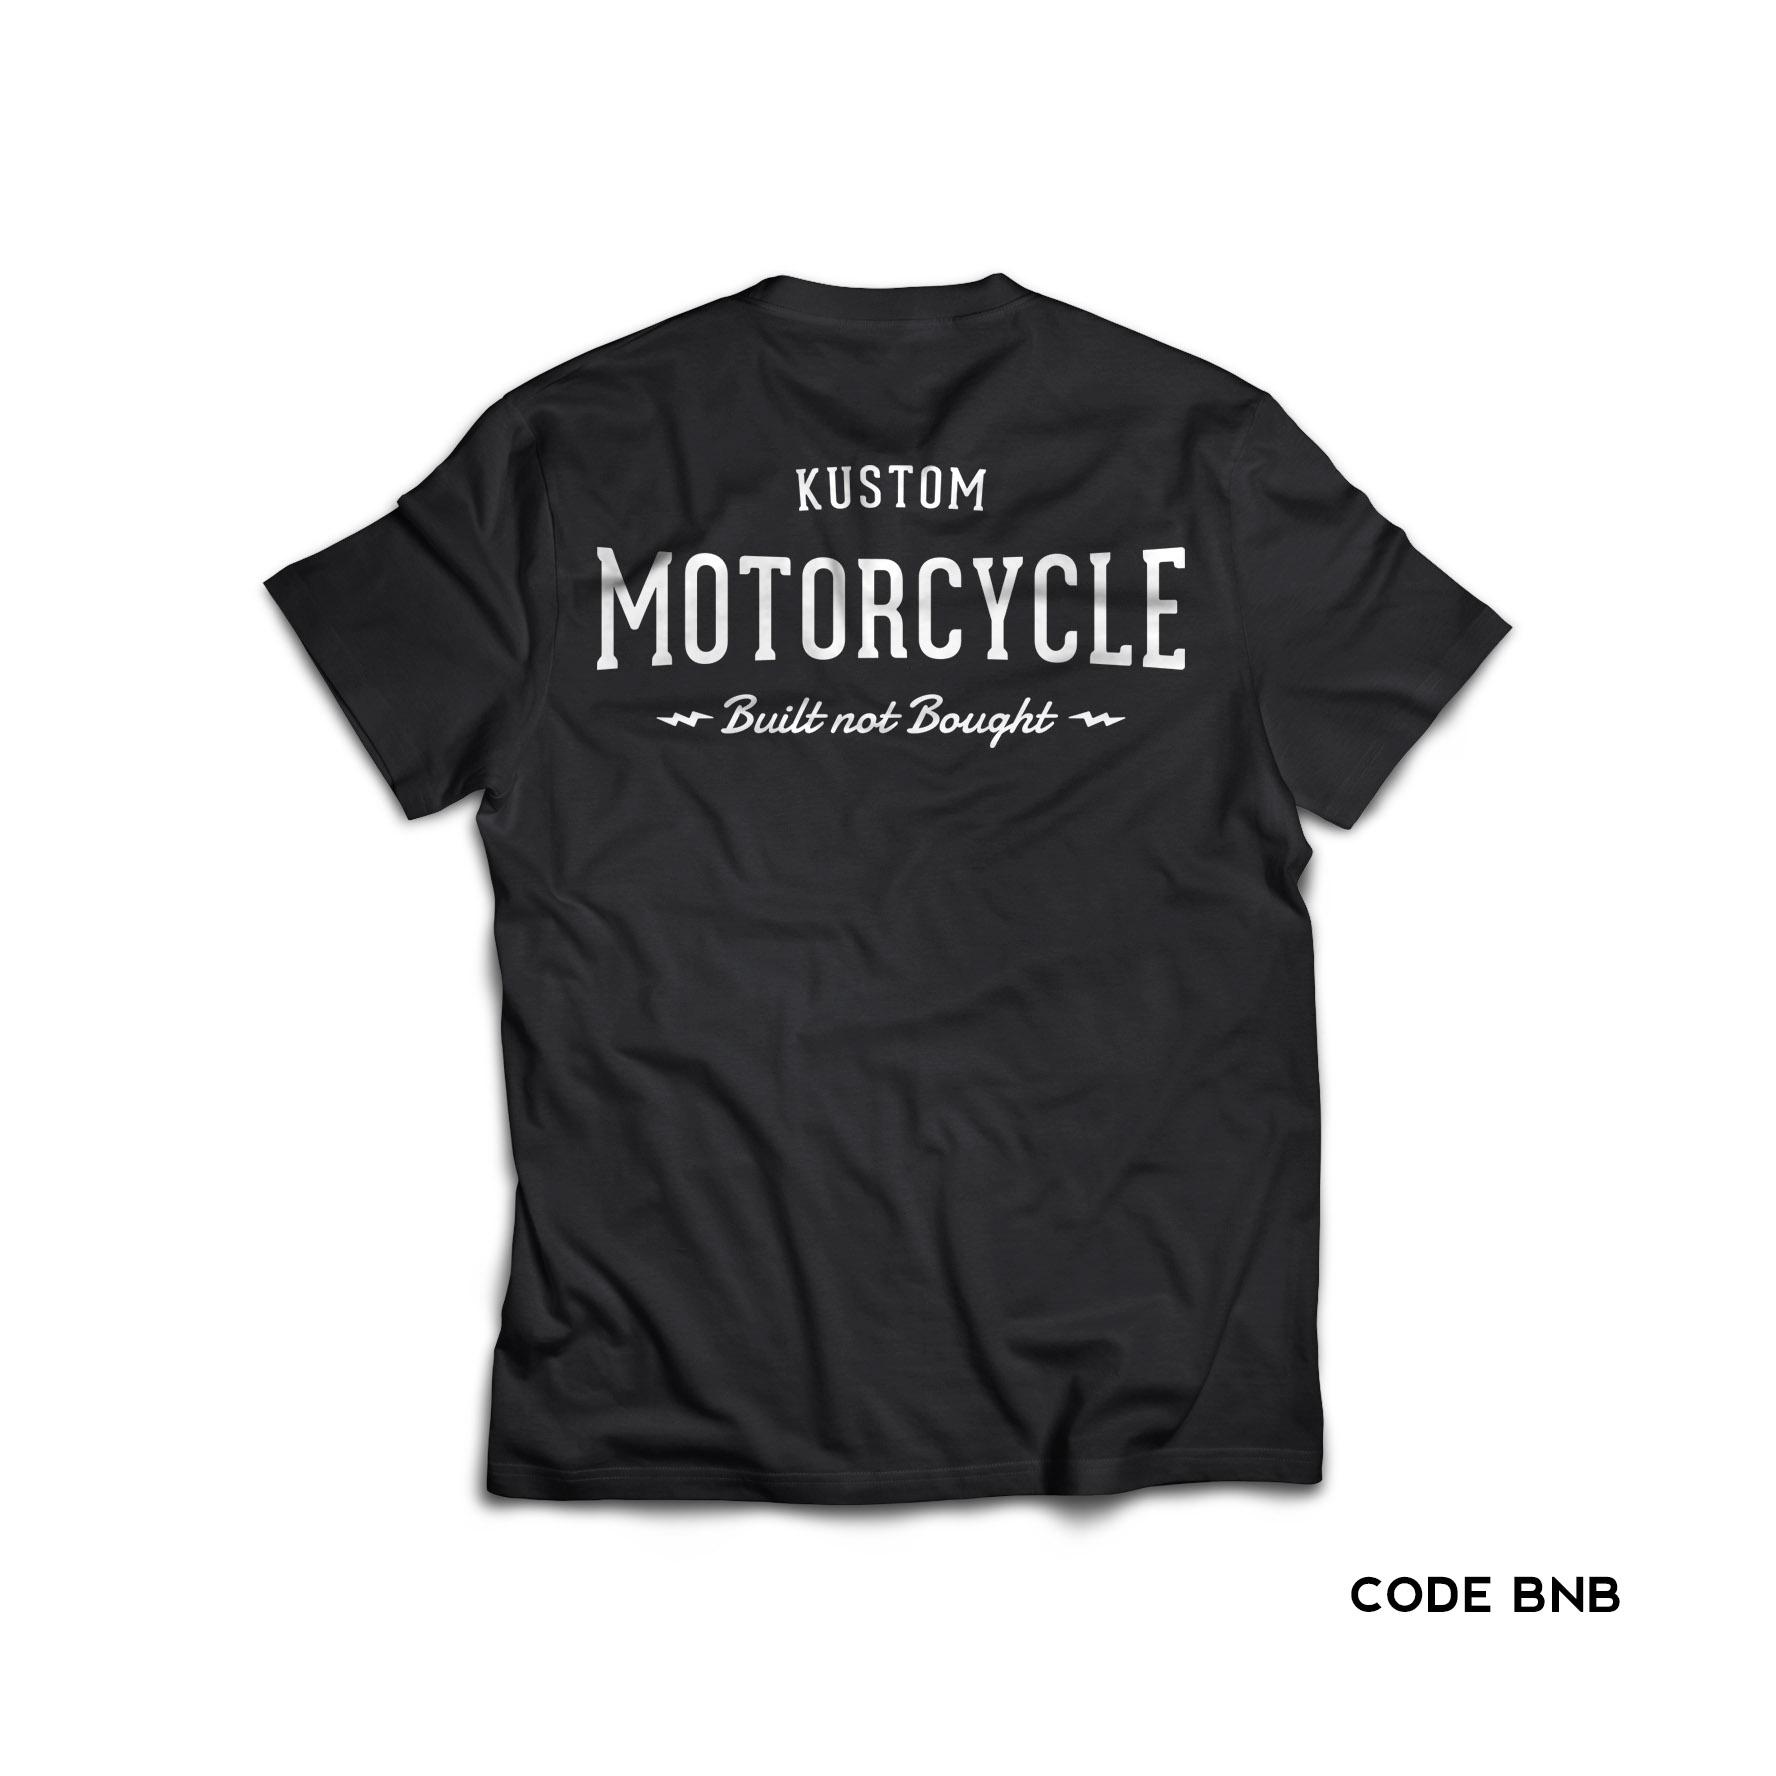 Kaos Motor Cafe Racer Kustomgaras Japstyle Trail Bratstyle Chopper Motocross Supermoto Deus Erigo Rodaduasampetua FMC Elder Garage